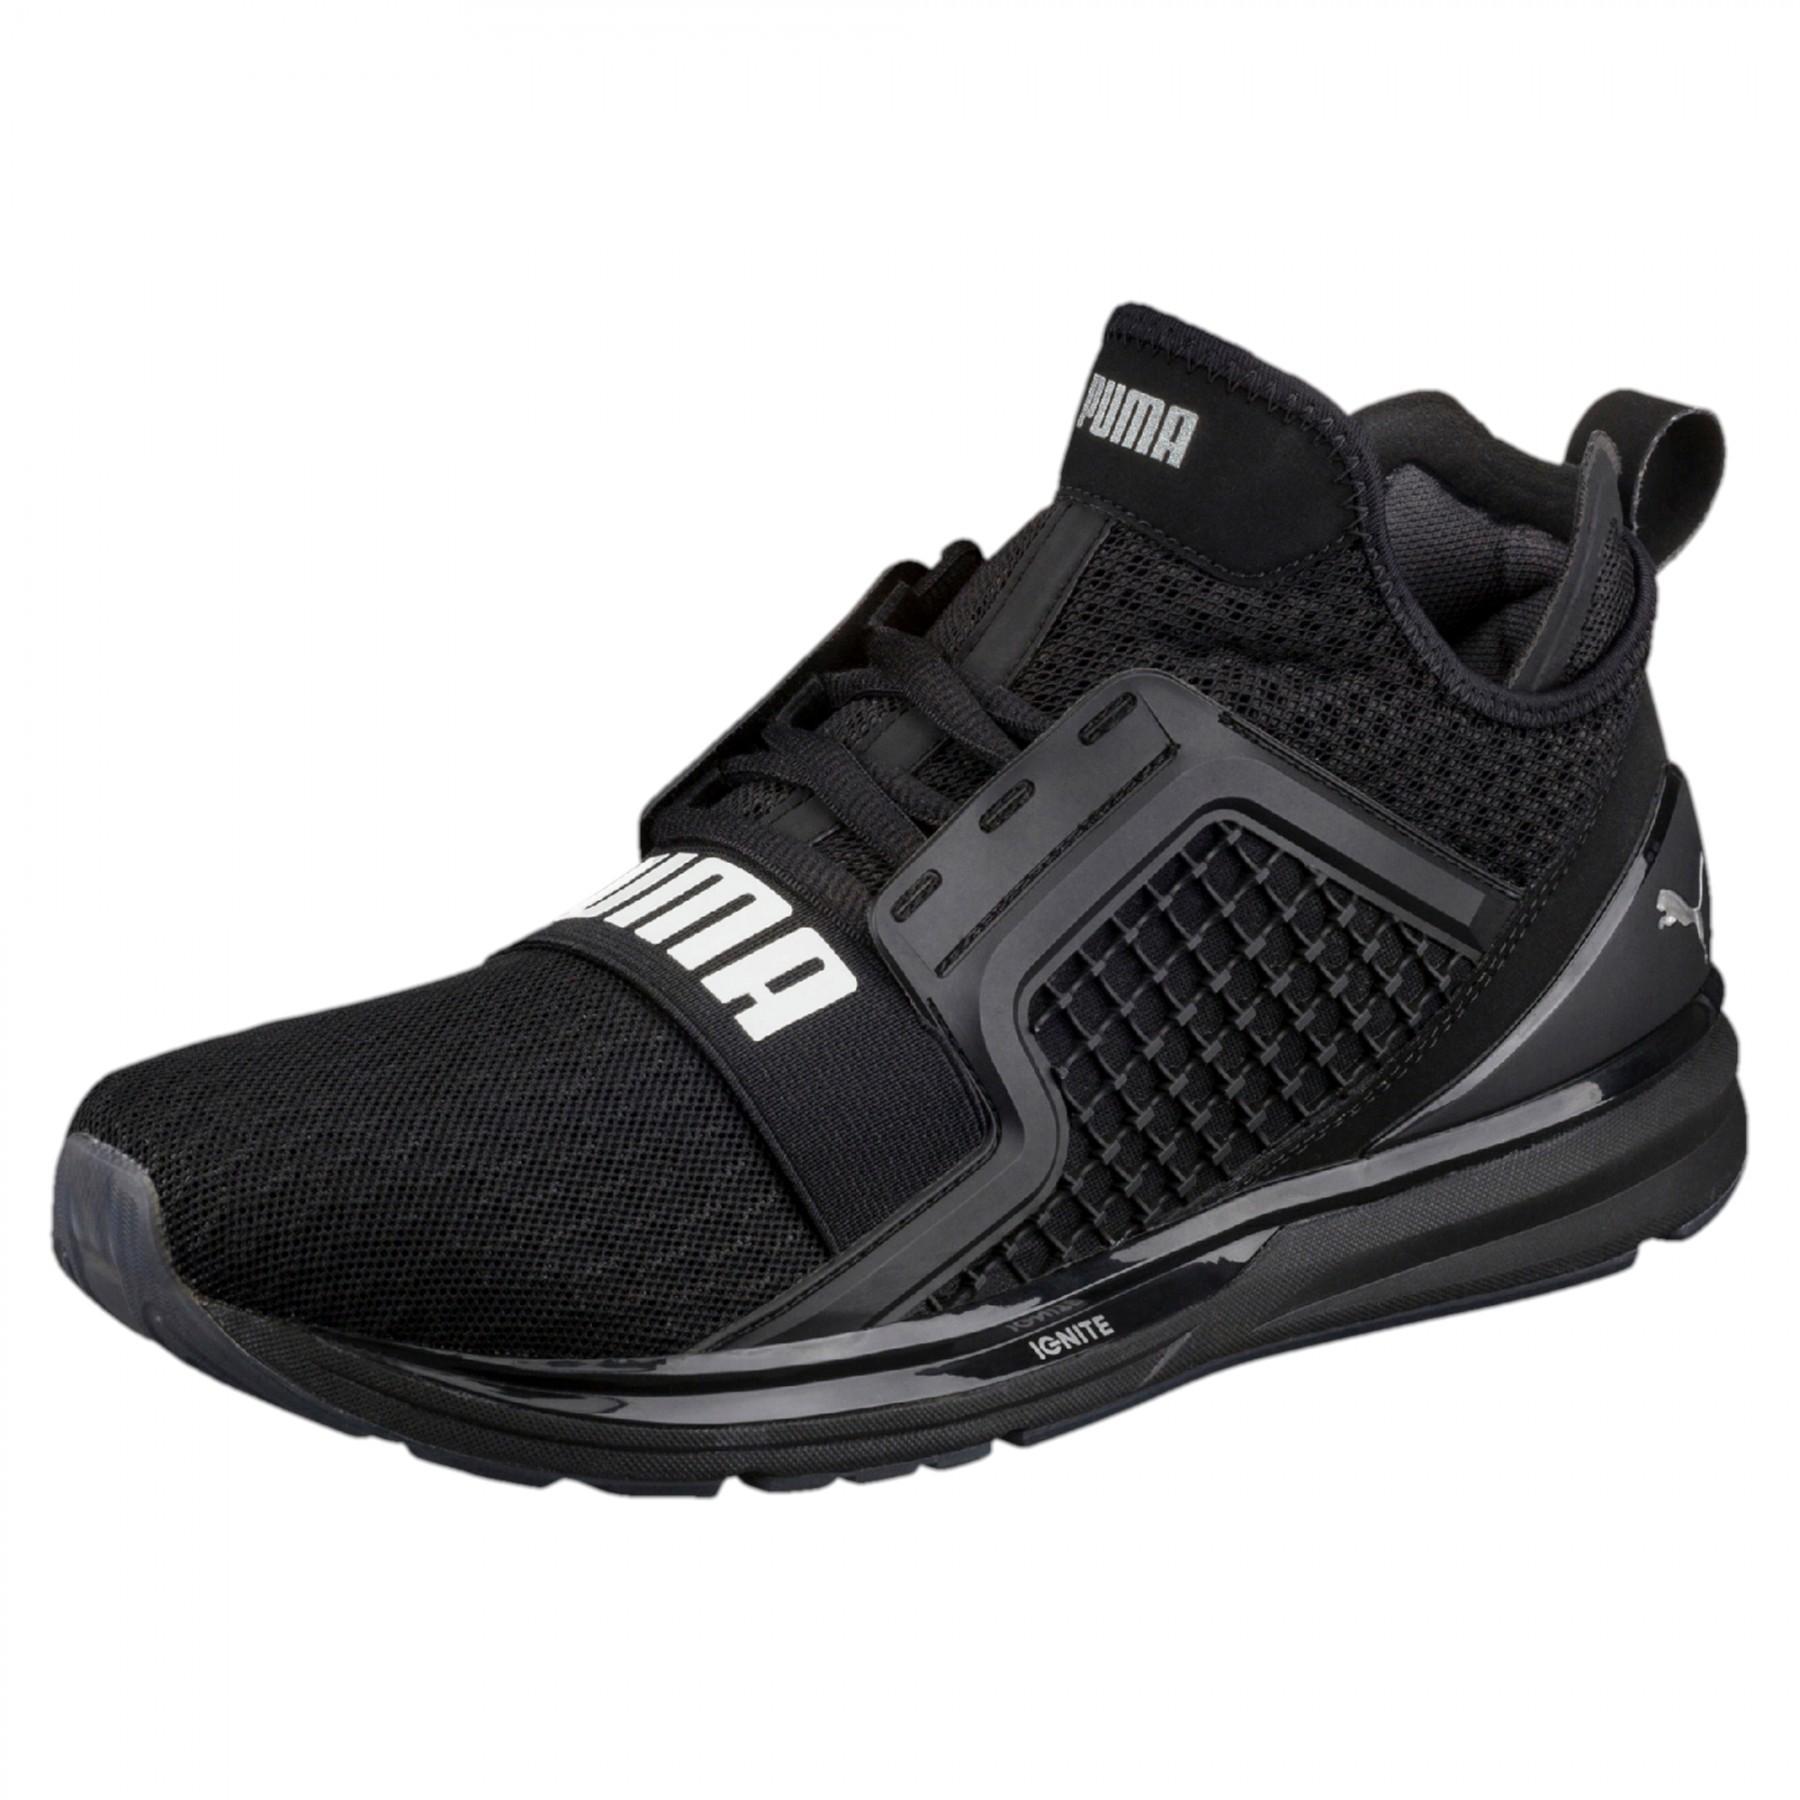 Shop Viratkohli Shoes On Seenit 24133